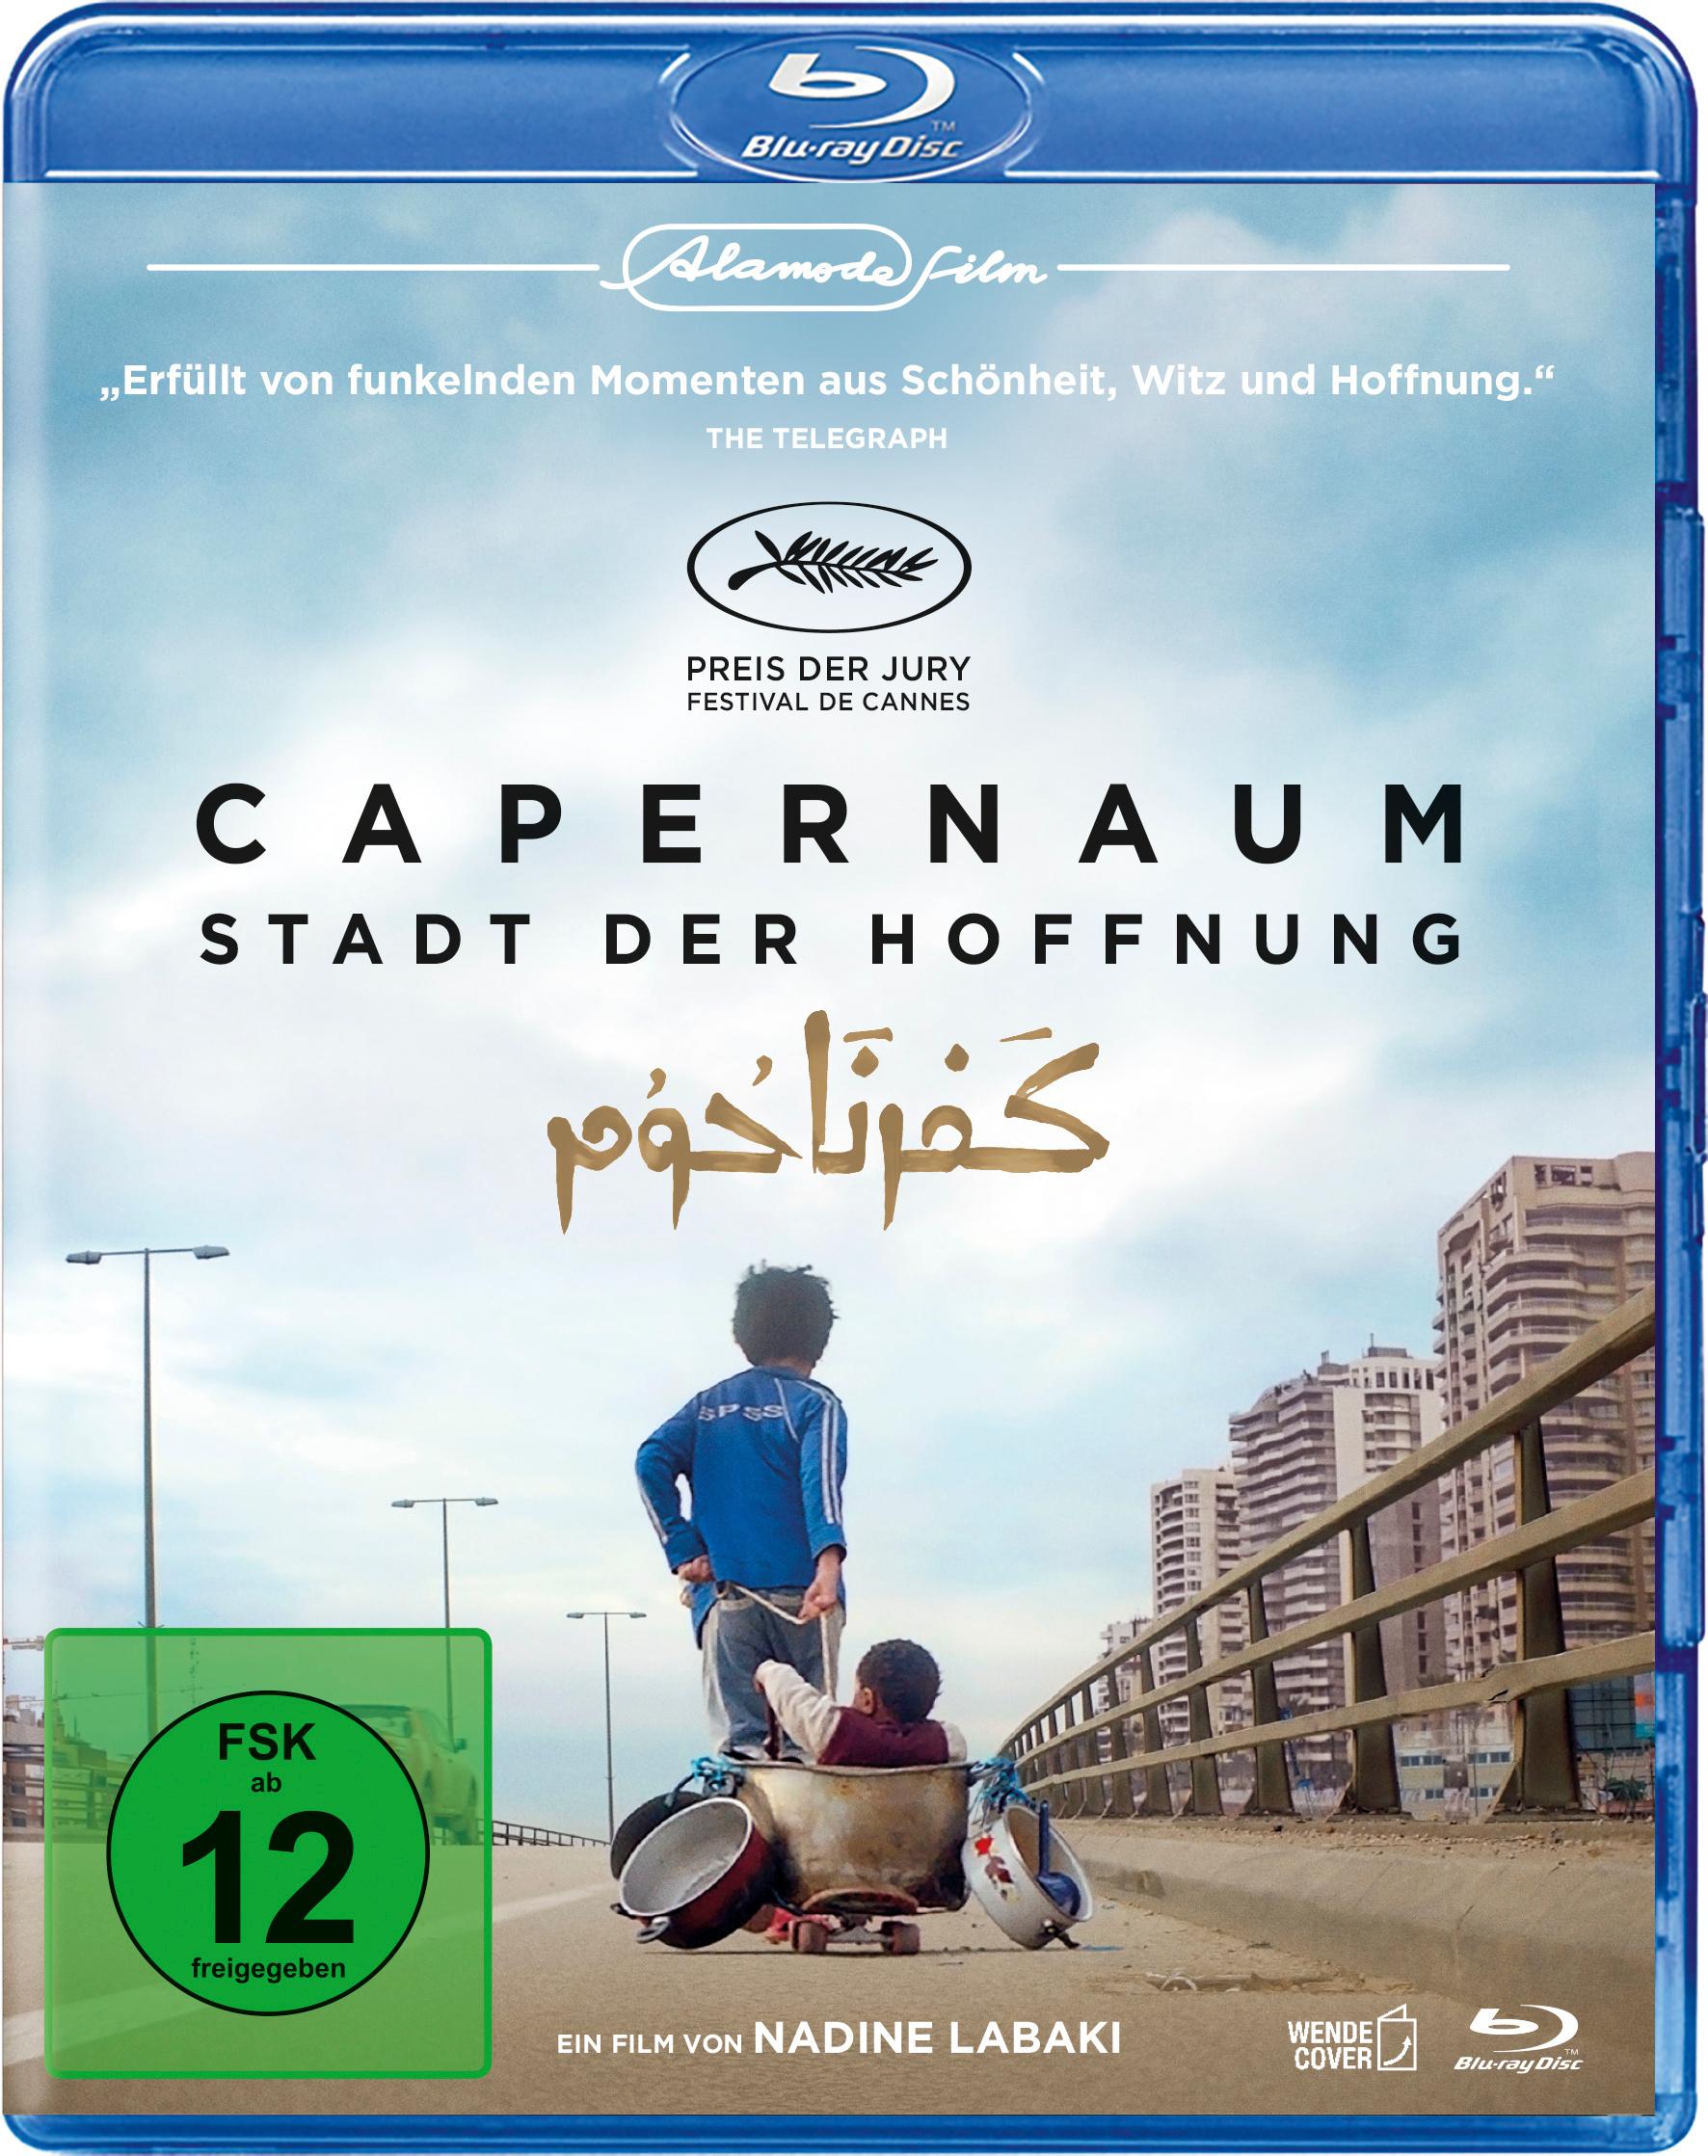 Image of Capernaum - Stadt der Hoffnung